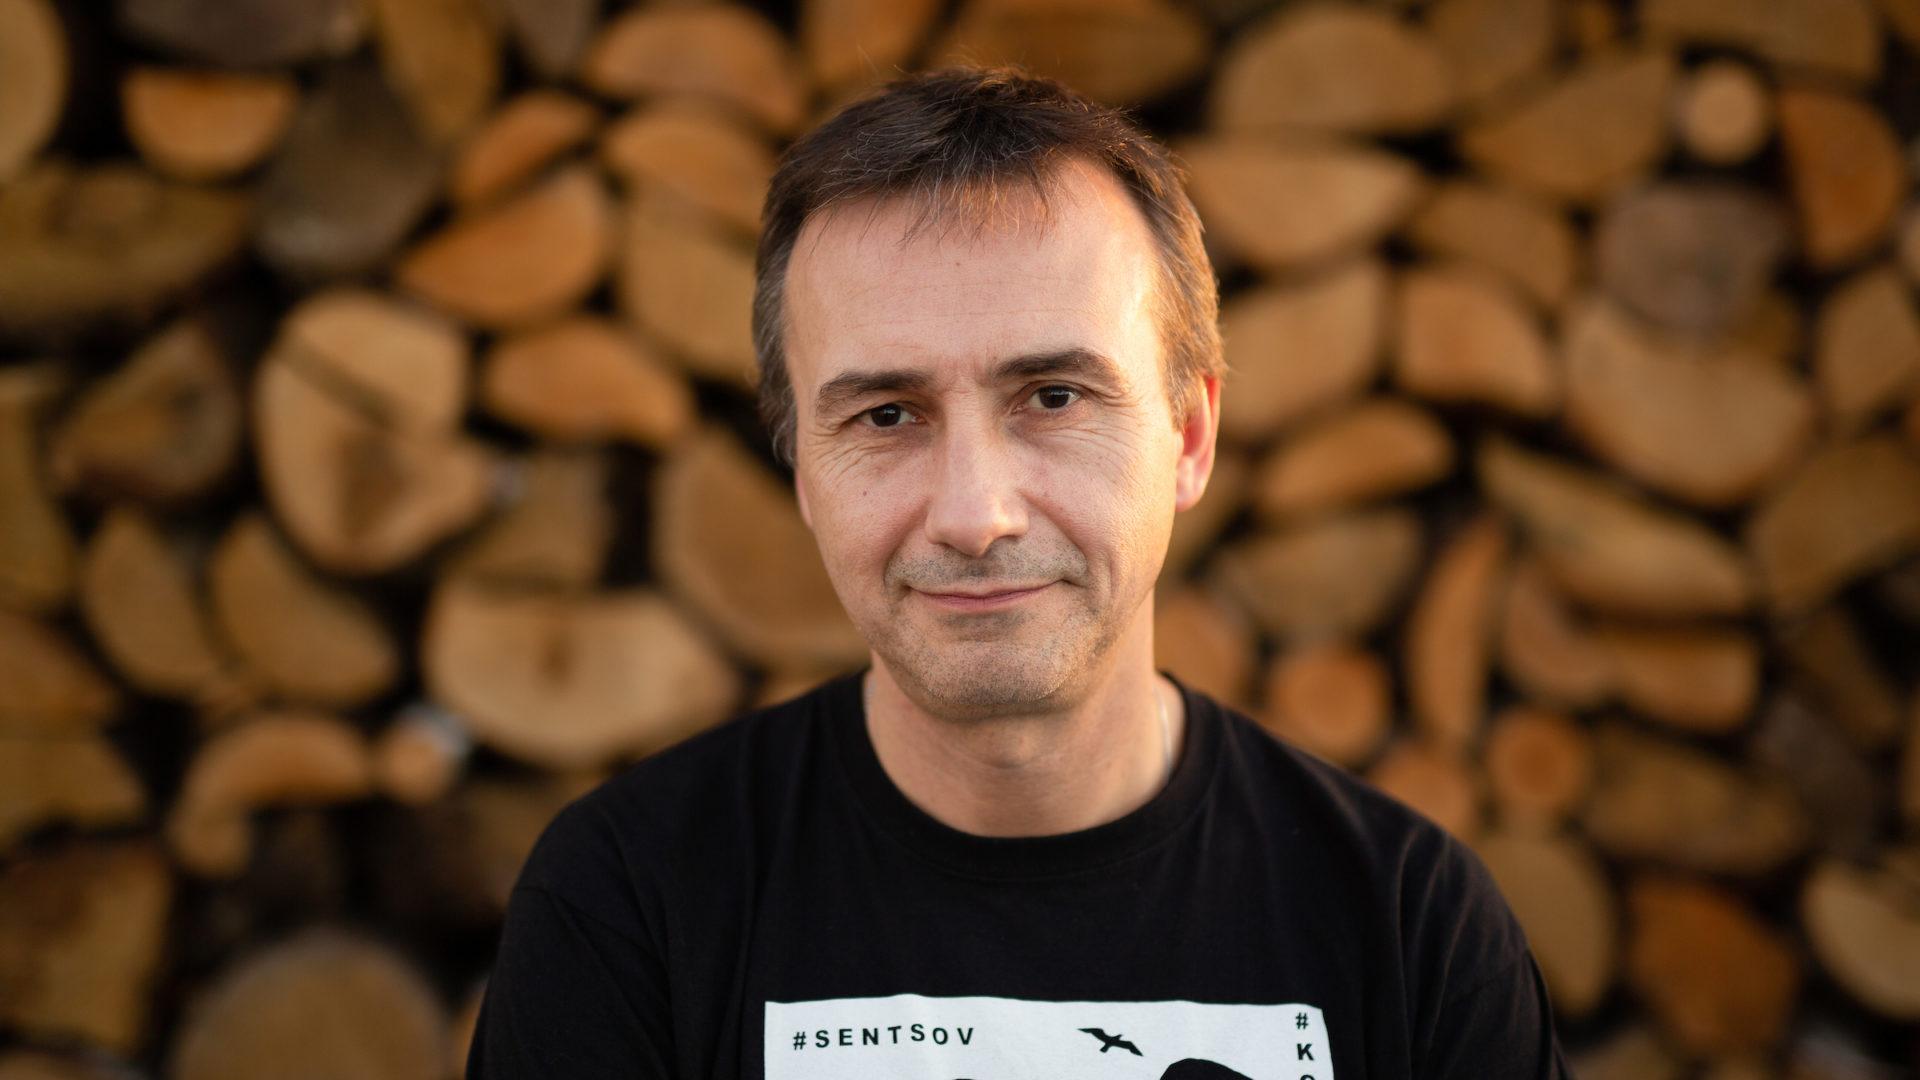 Serhiy Burov, Educational Human Rights House Chernihiv